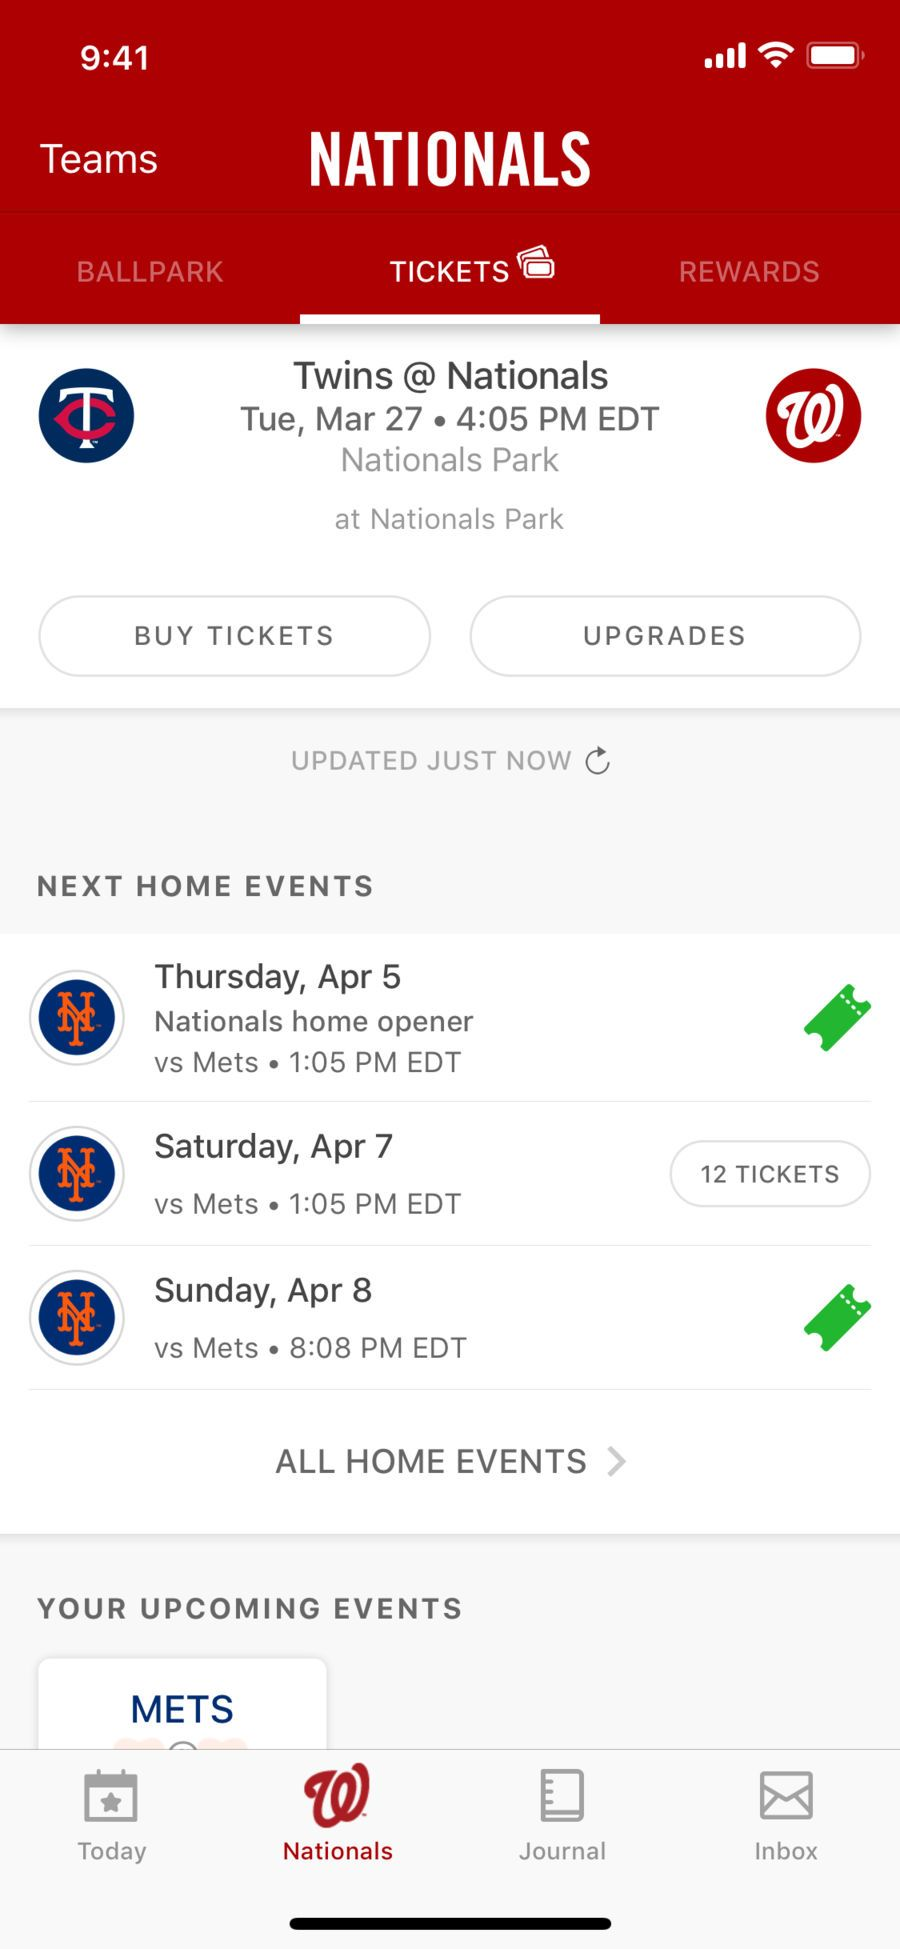 Mlb Ballpark Ios Apps App Entertainment Ballparks Mlb App